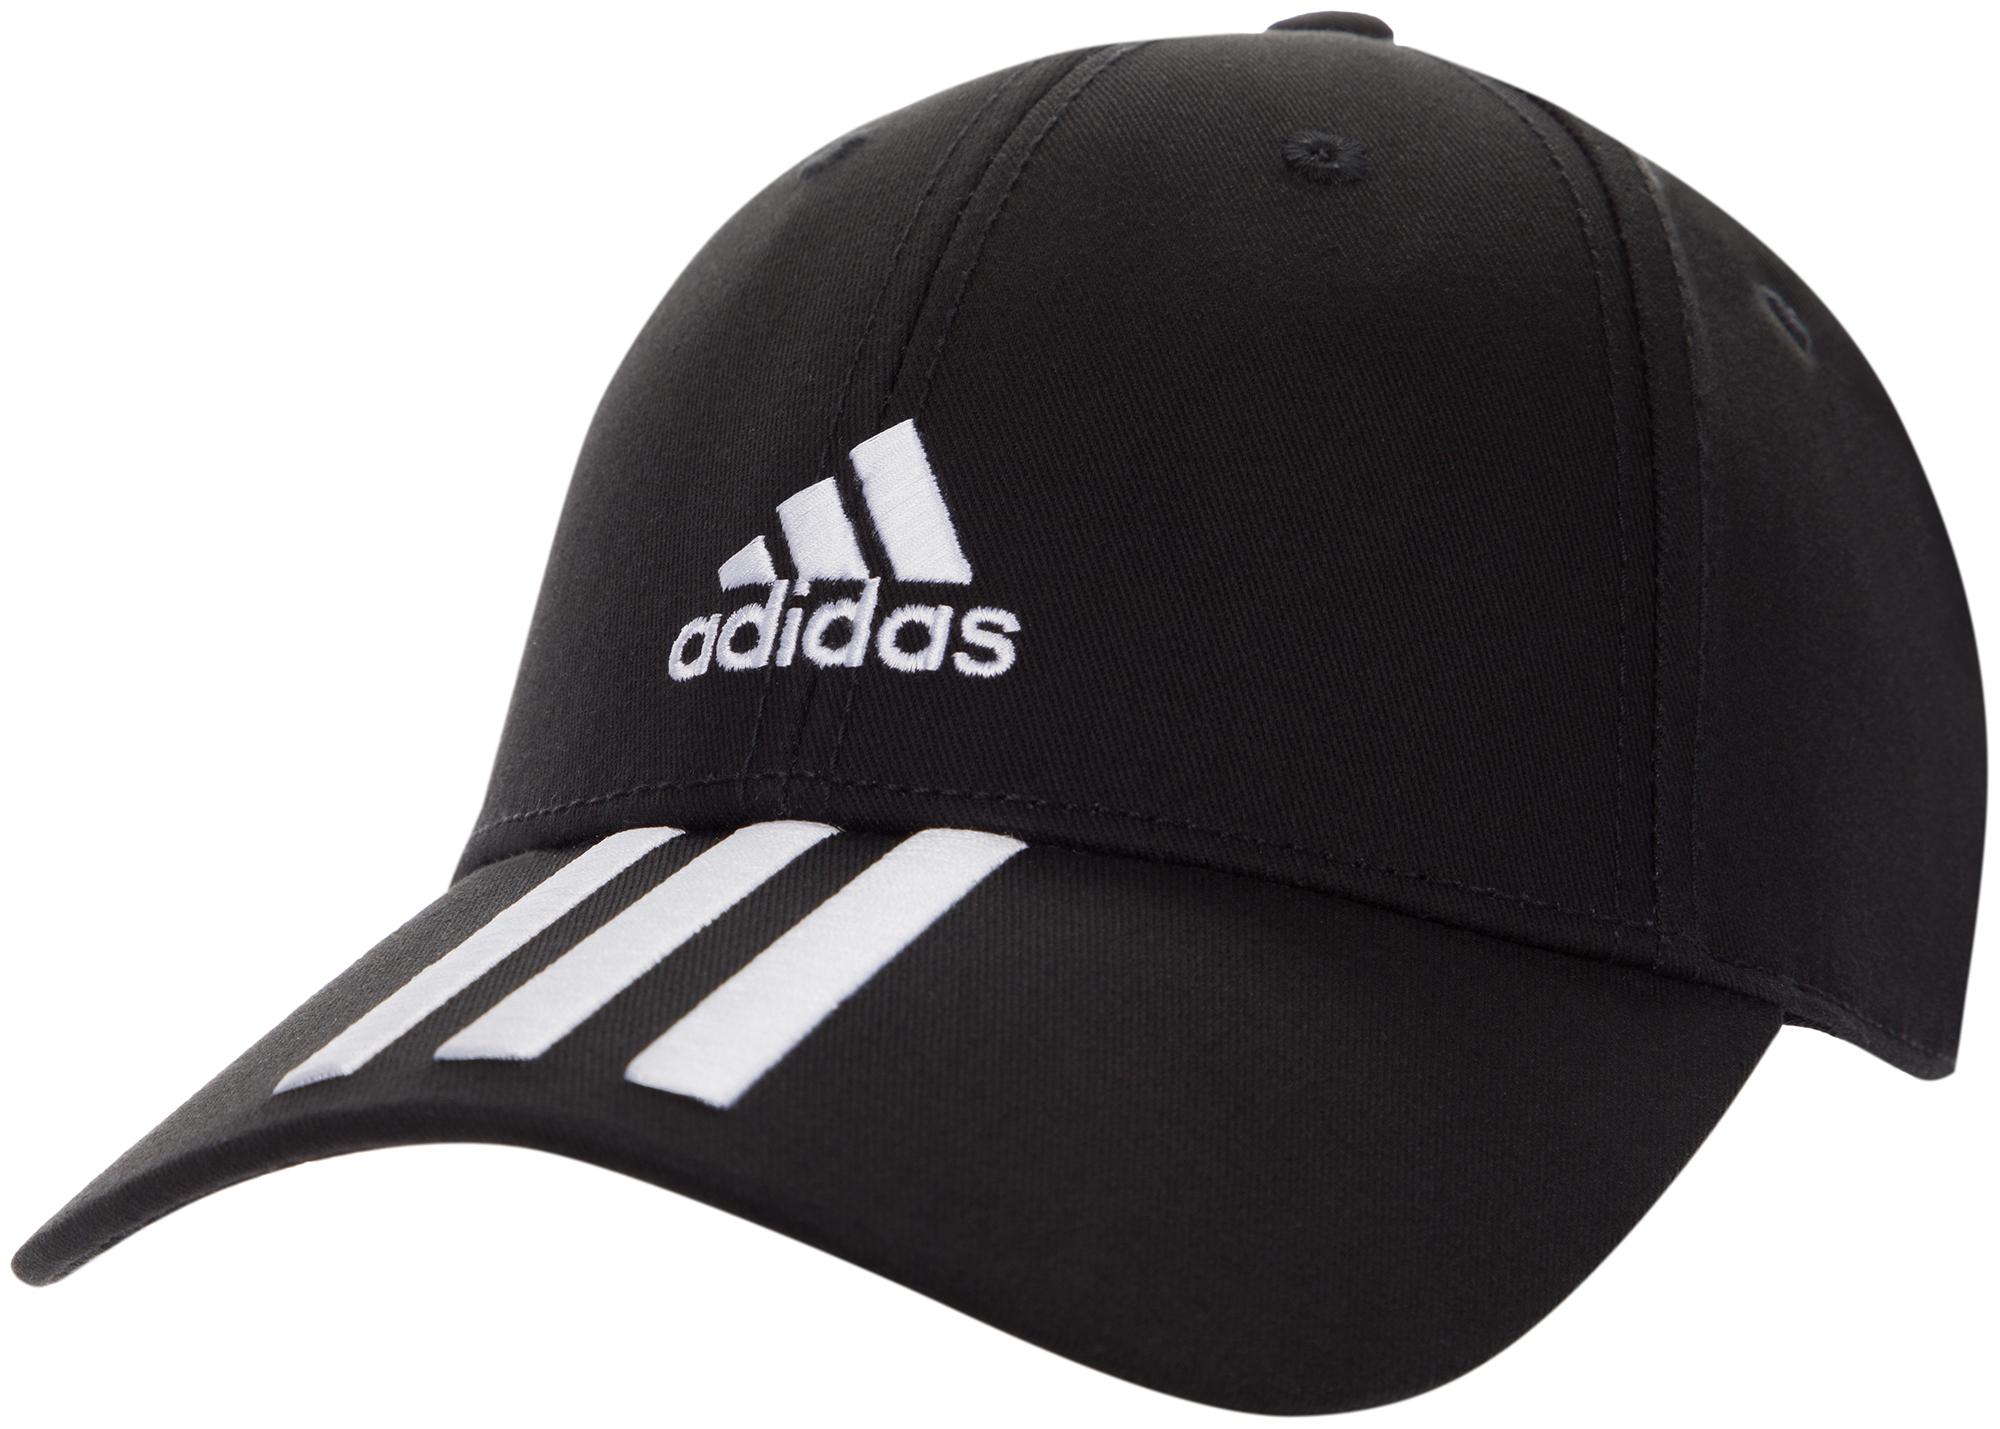 Adidas Бейсболка мужская Adidas, размер 58